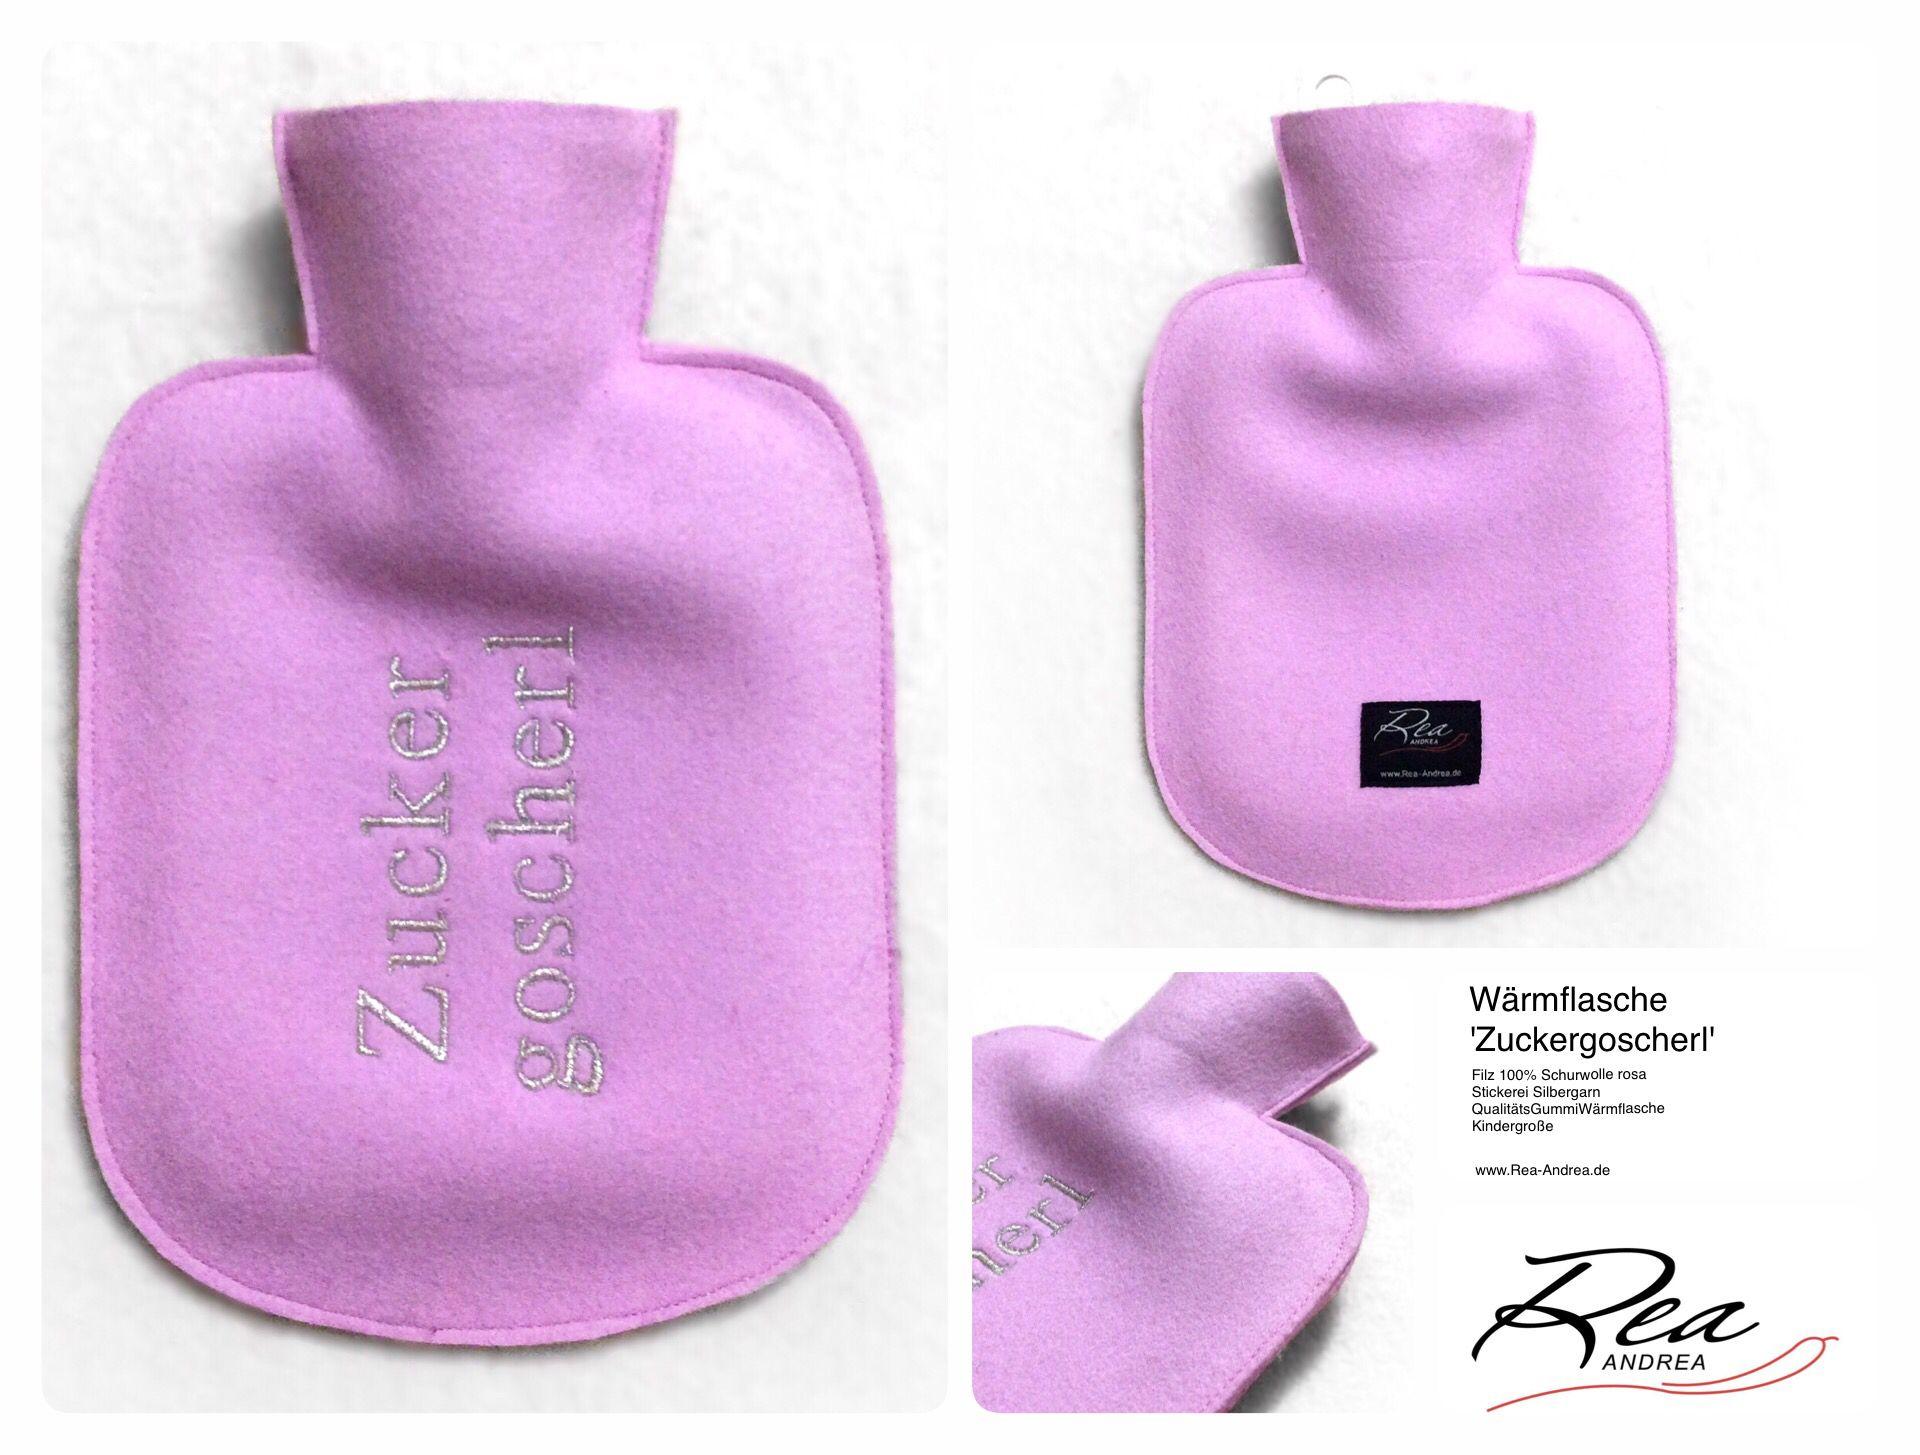 Wärmflasche 'Zuckergoscherl' -- Filz 100% Schurwolle rosa - Stickerei Silbergarn - QualitätsGummiWärmflasche - Kindergröße